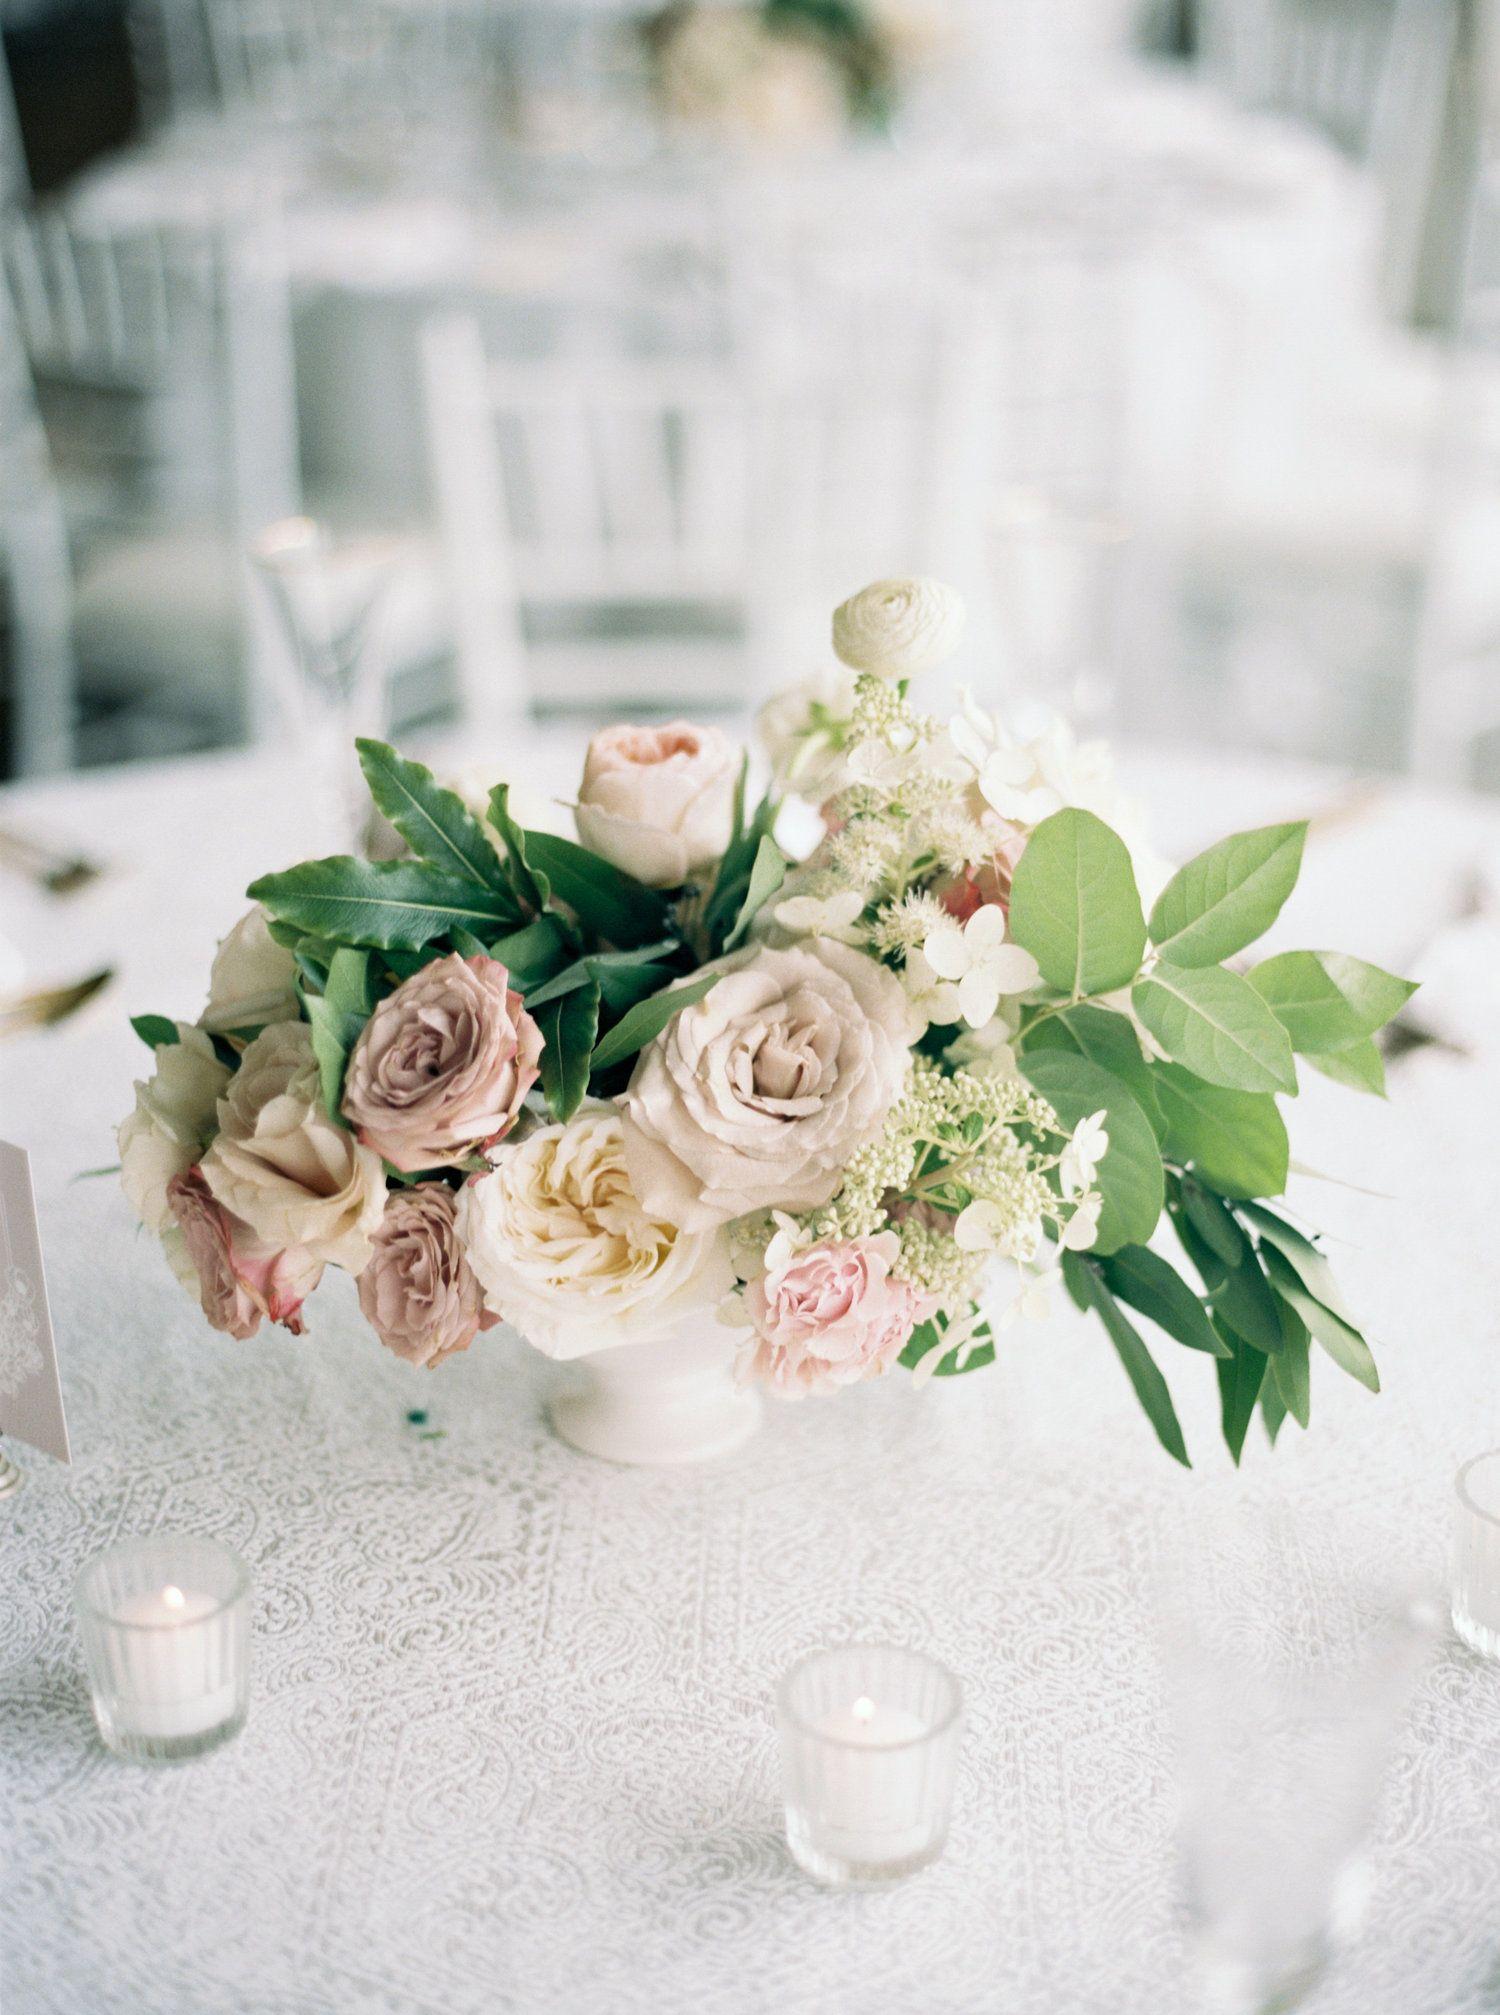 La Tavola Fine Linen Rental Beatrice Garden Smoke With Hemstitch White Napkins Photography Elizabeth Laduca Rose Petal Aisle Wedding Wedding Event Planner